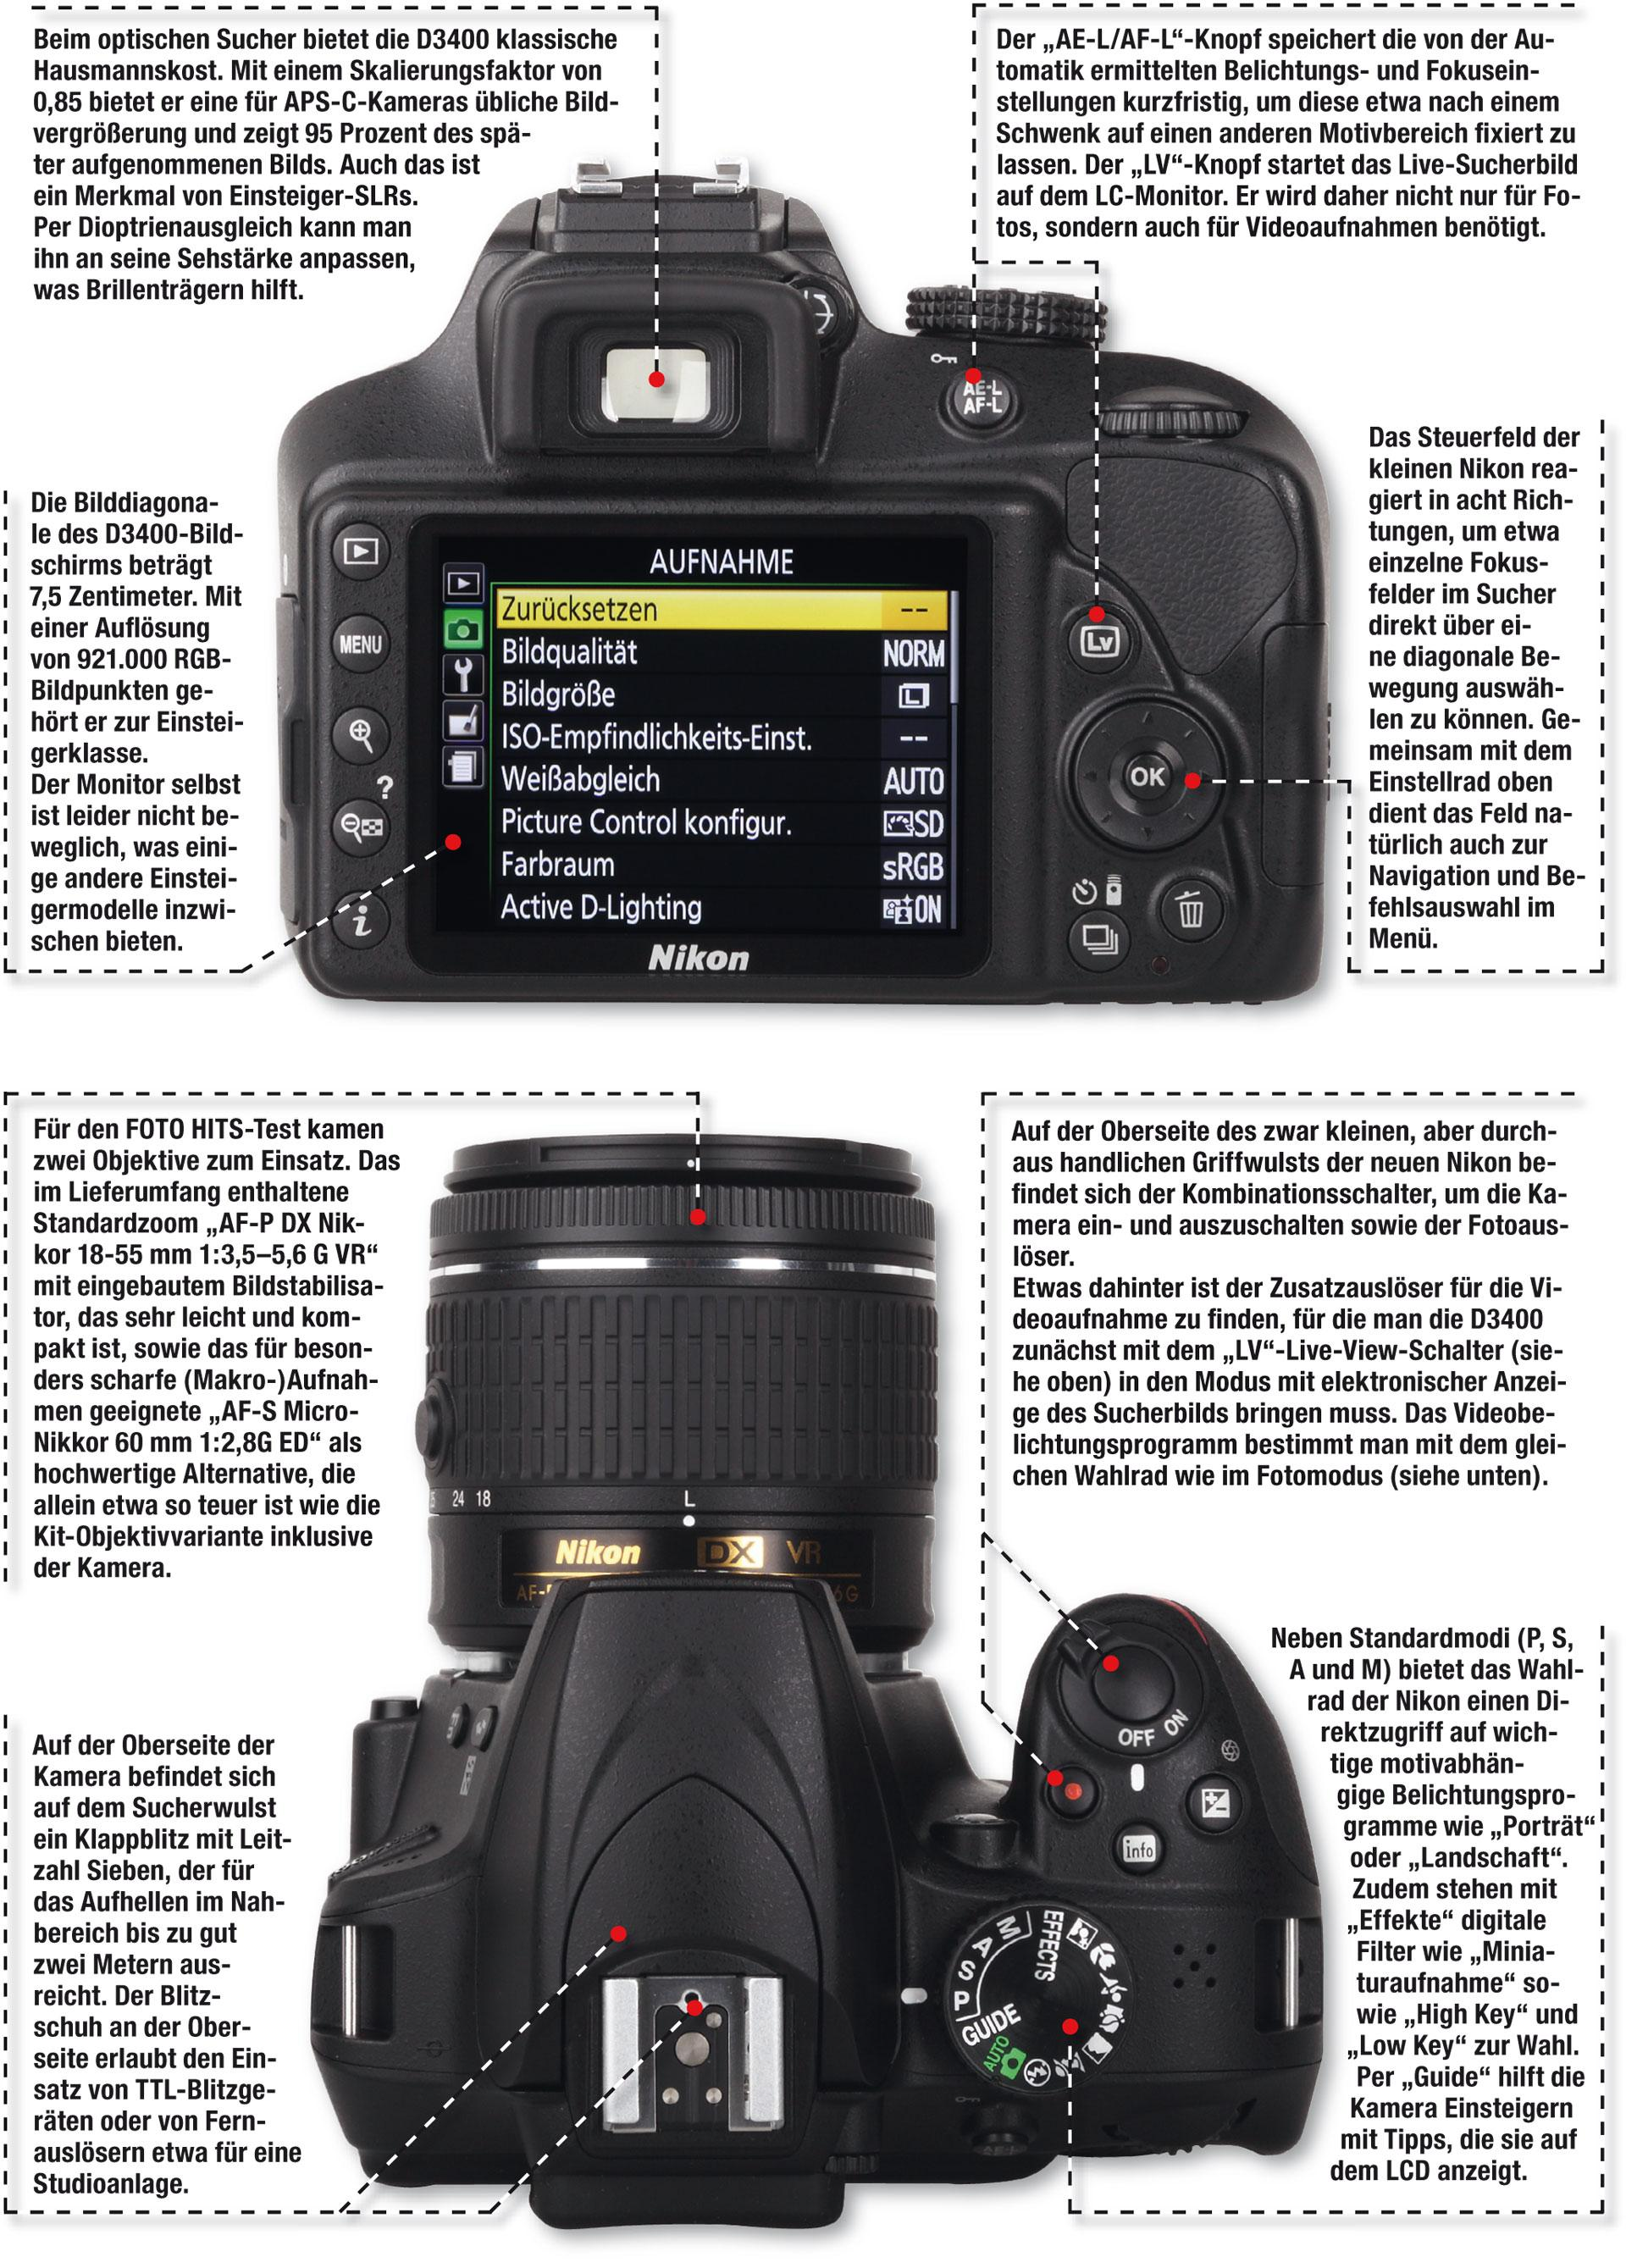 Kameratest Nikon D3400 | FOTO HITS Magazin